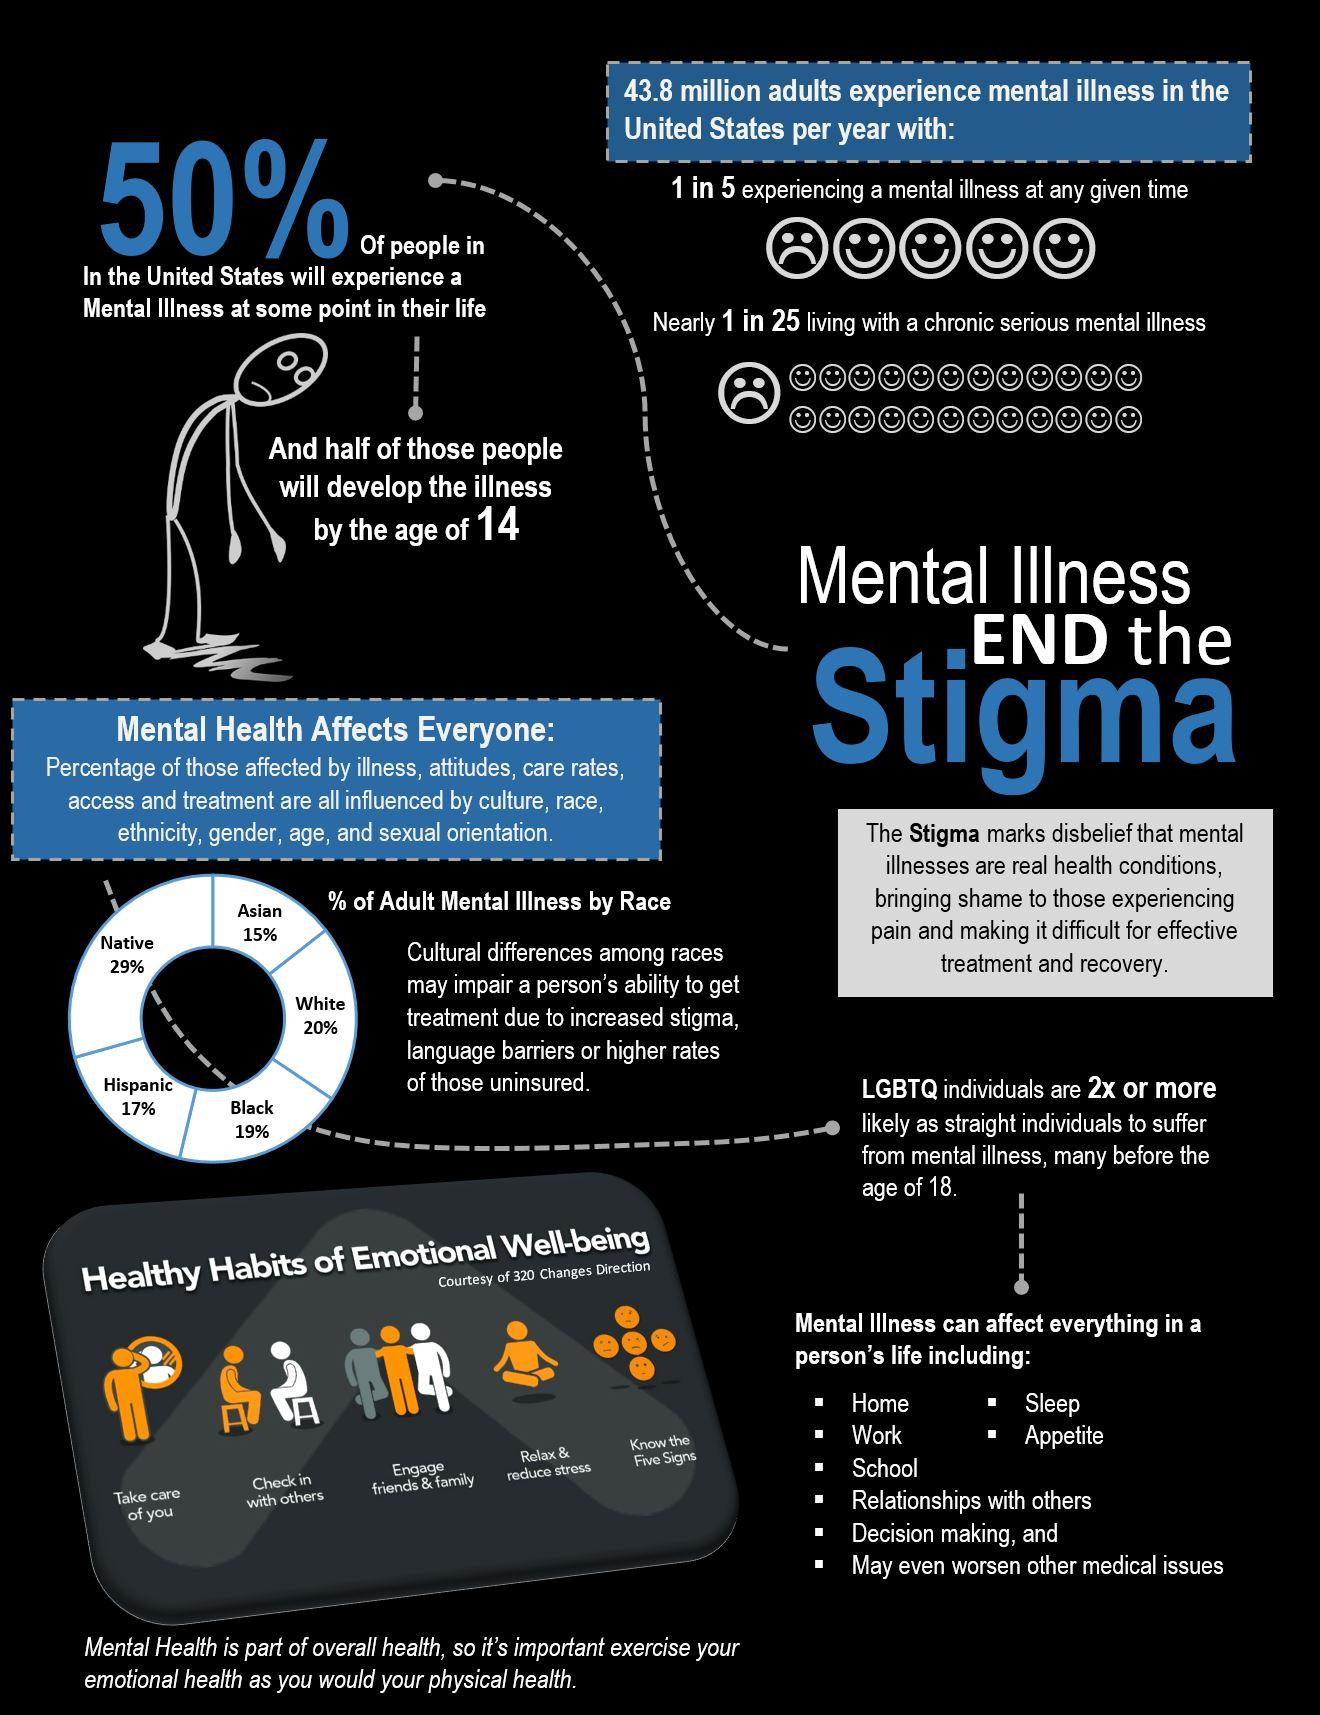 Mental Illness Cover Sheet.JPG